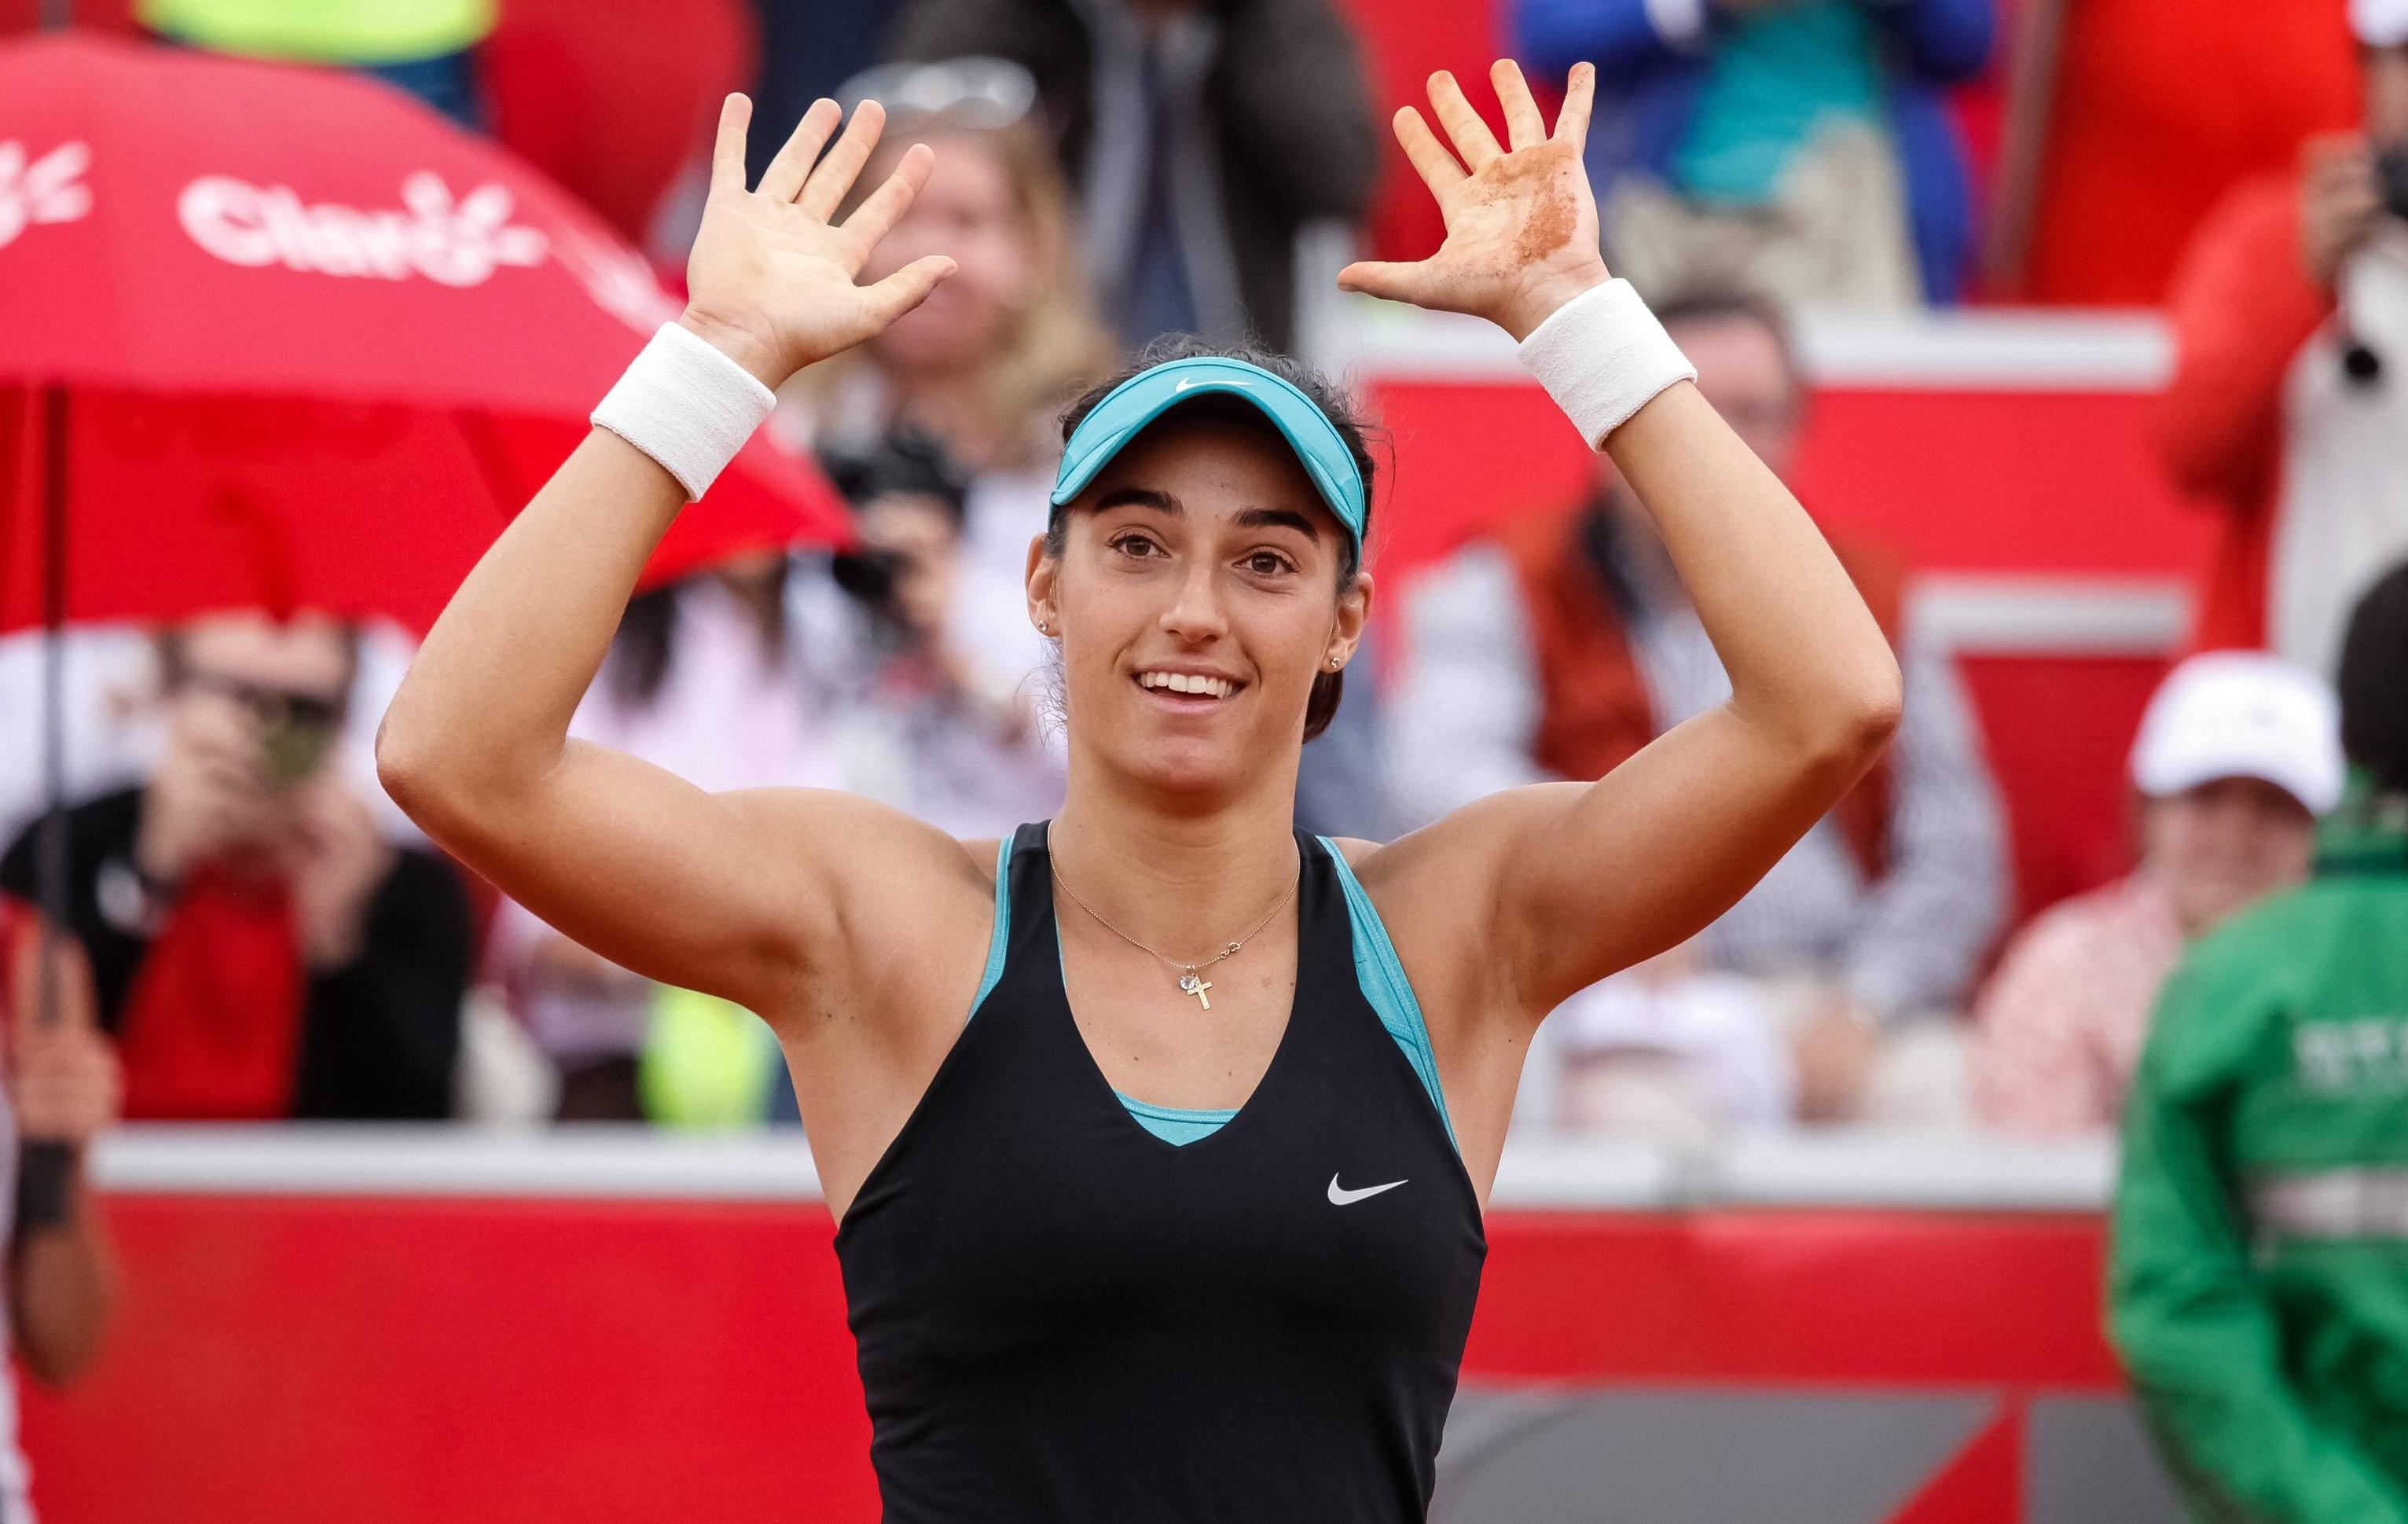 Tennis : WTA - Garcia toujours sur son nuage, Williams requinqu�e